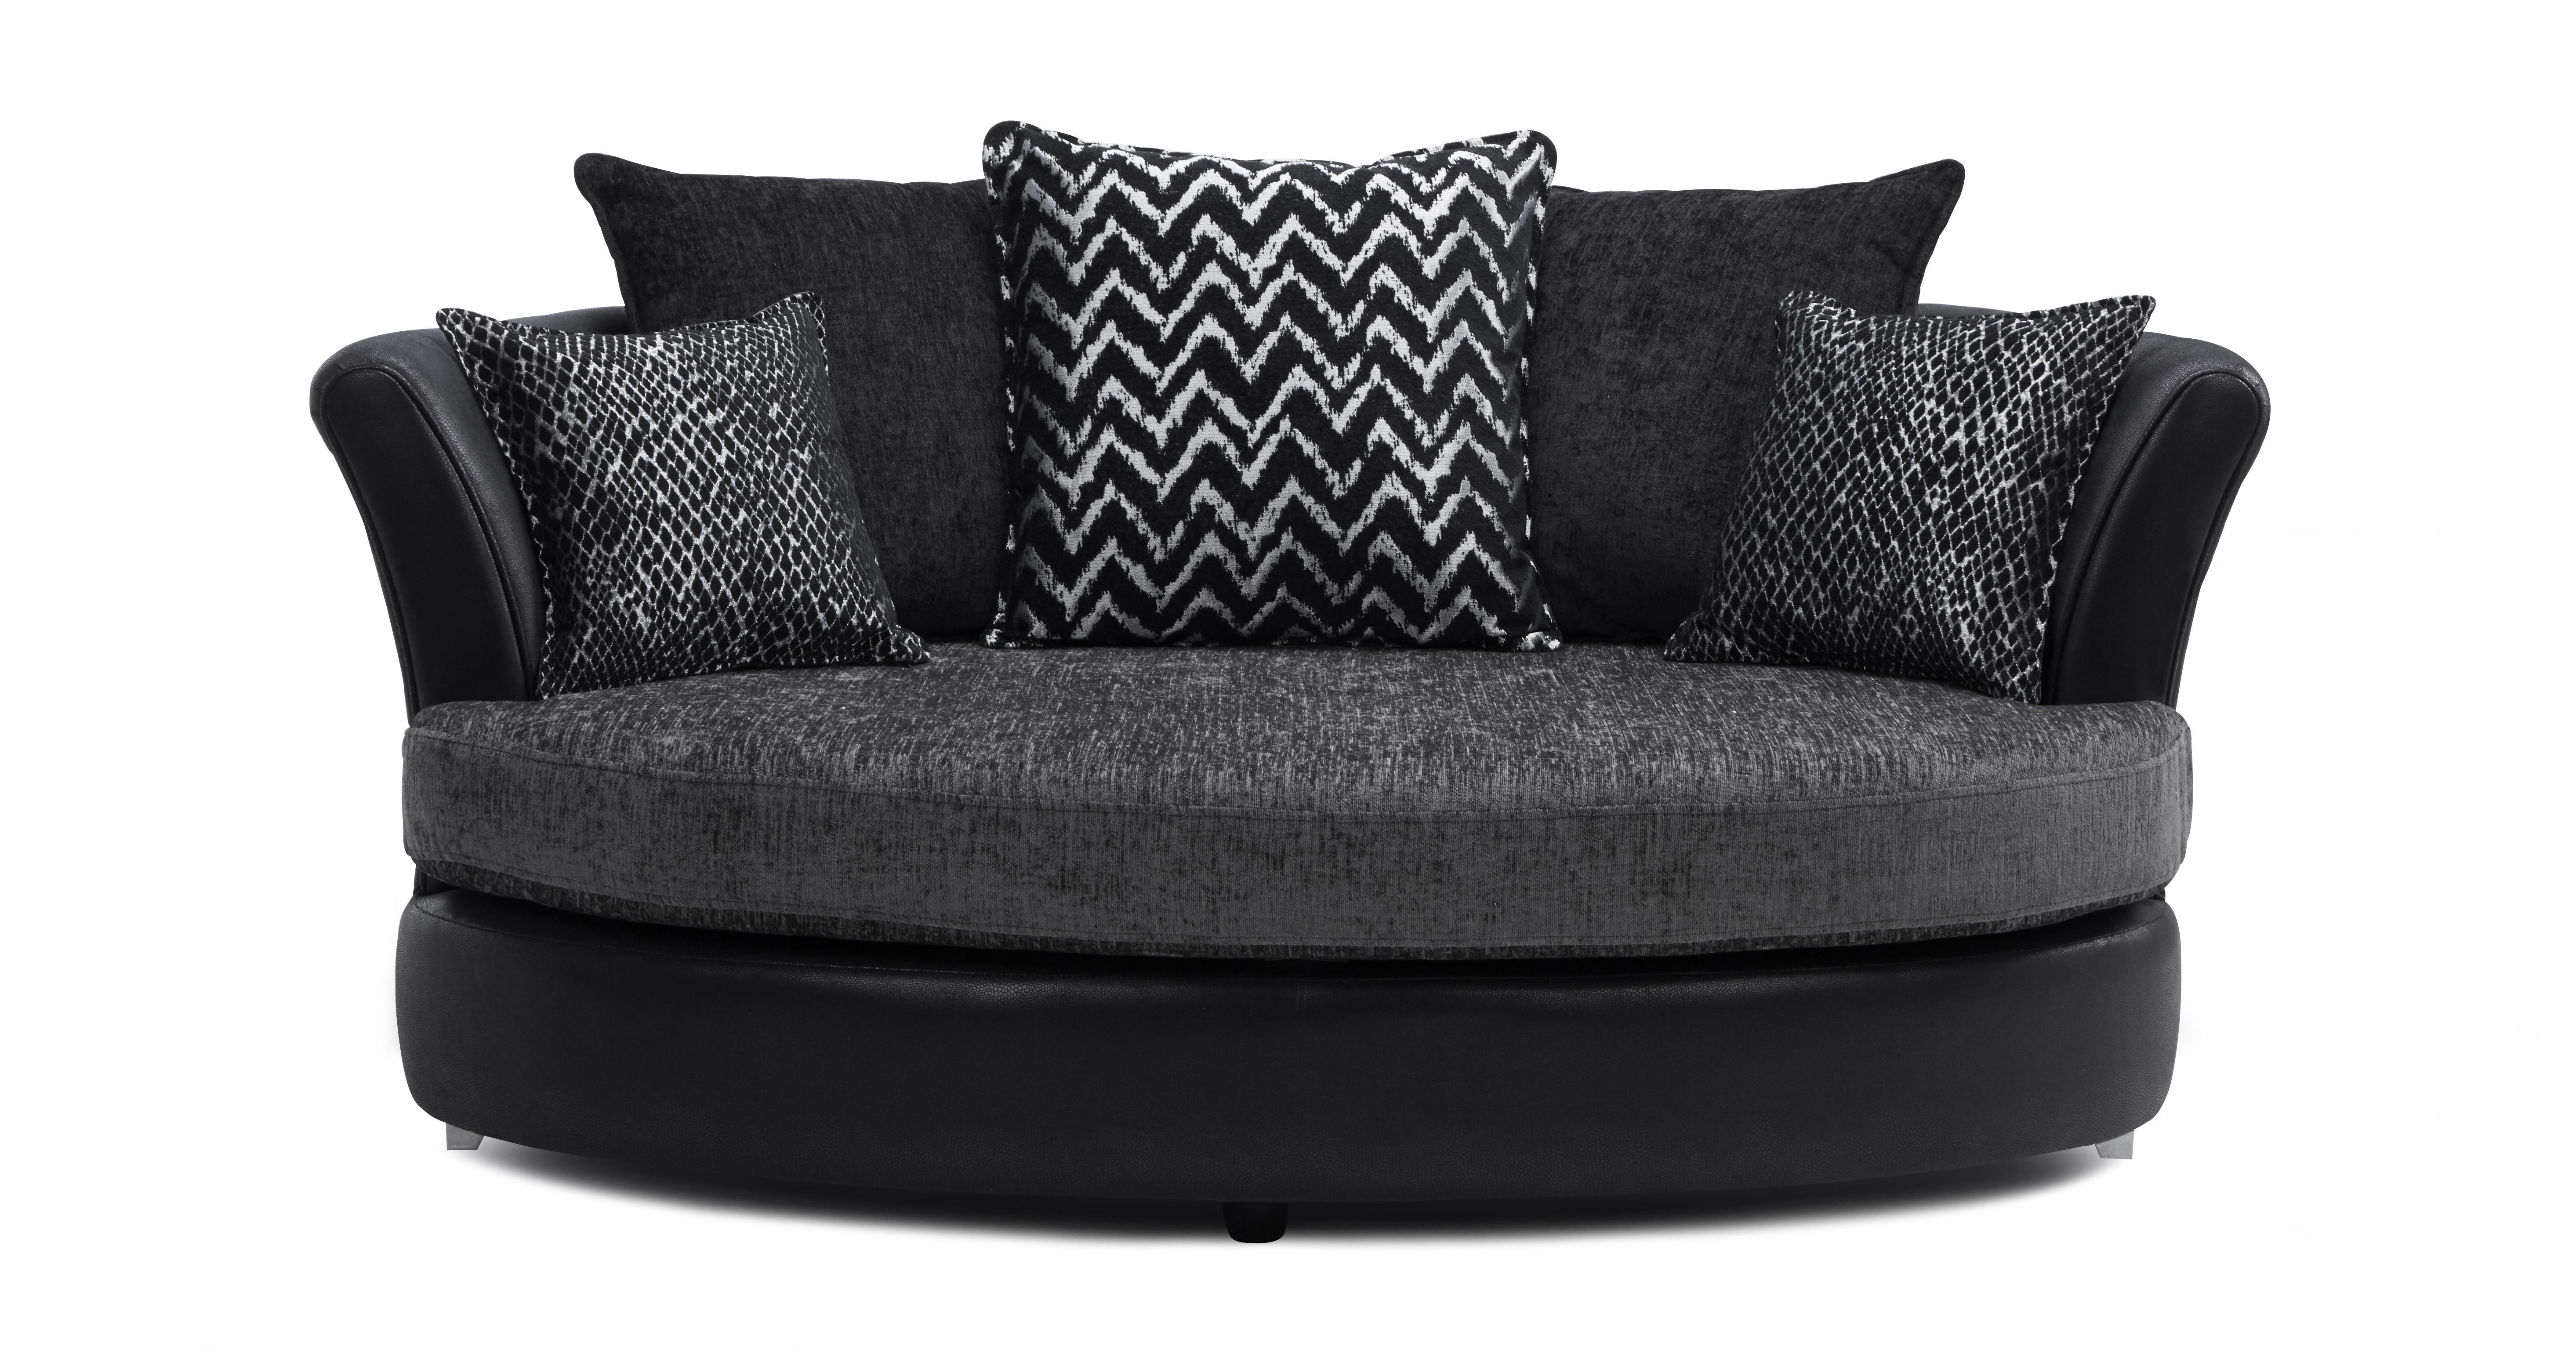 nicoletti lipari grey italian leather sofa chaise ashley furniture quality charcoal uk baci living room